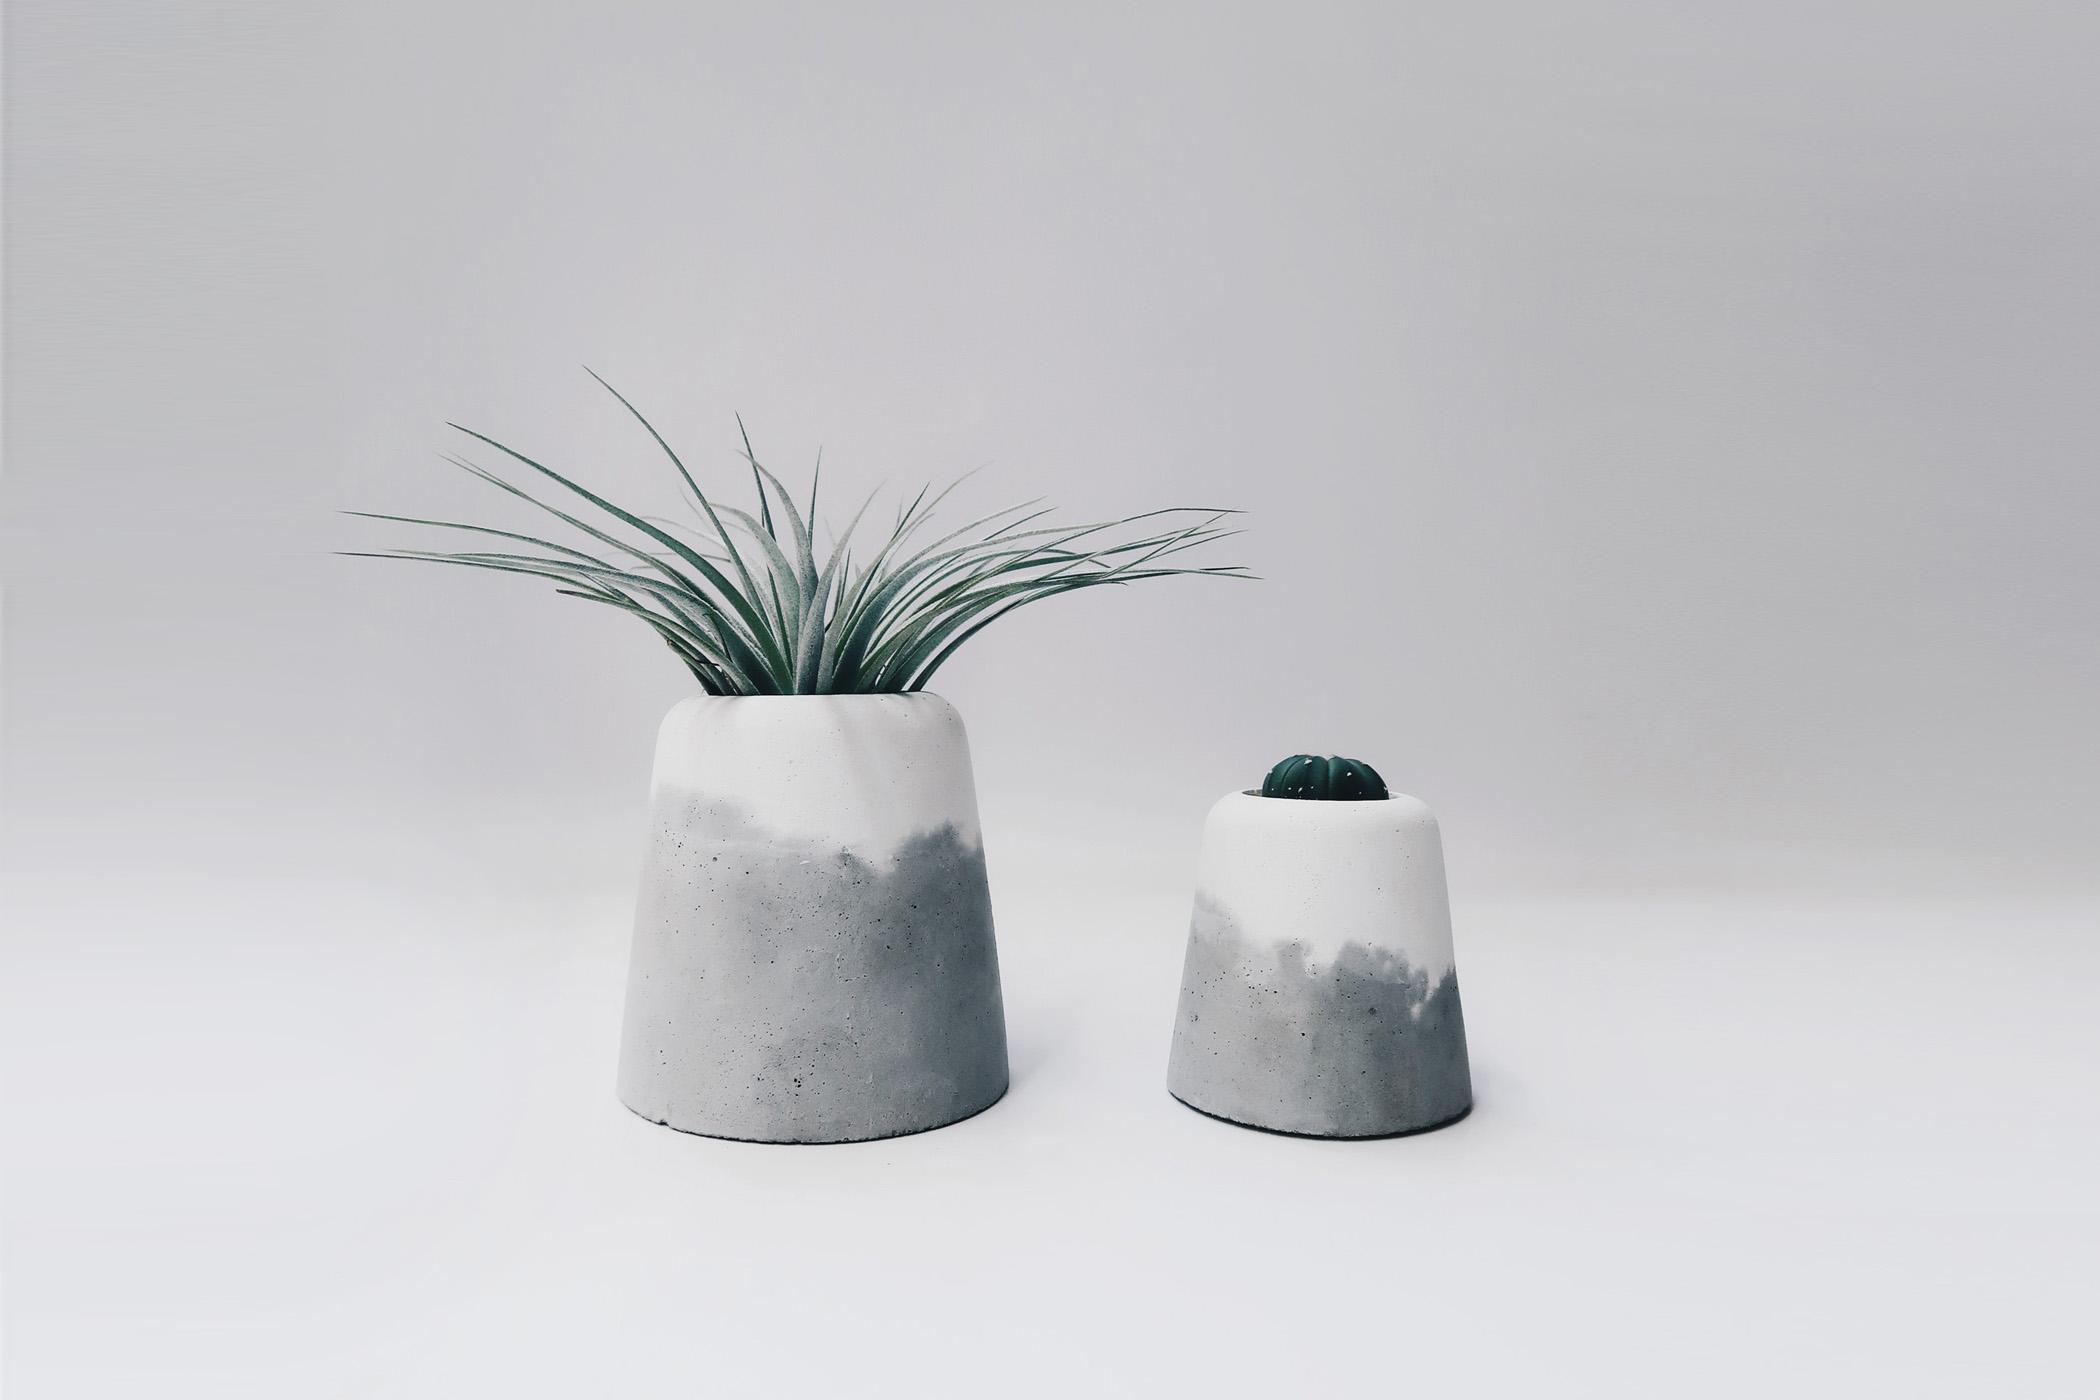 SNOW VOLCANO 大雪火山雙色水泥盆器